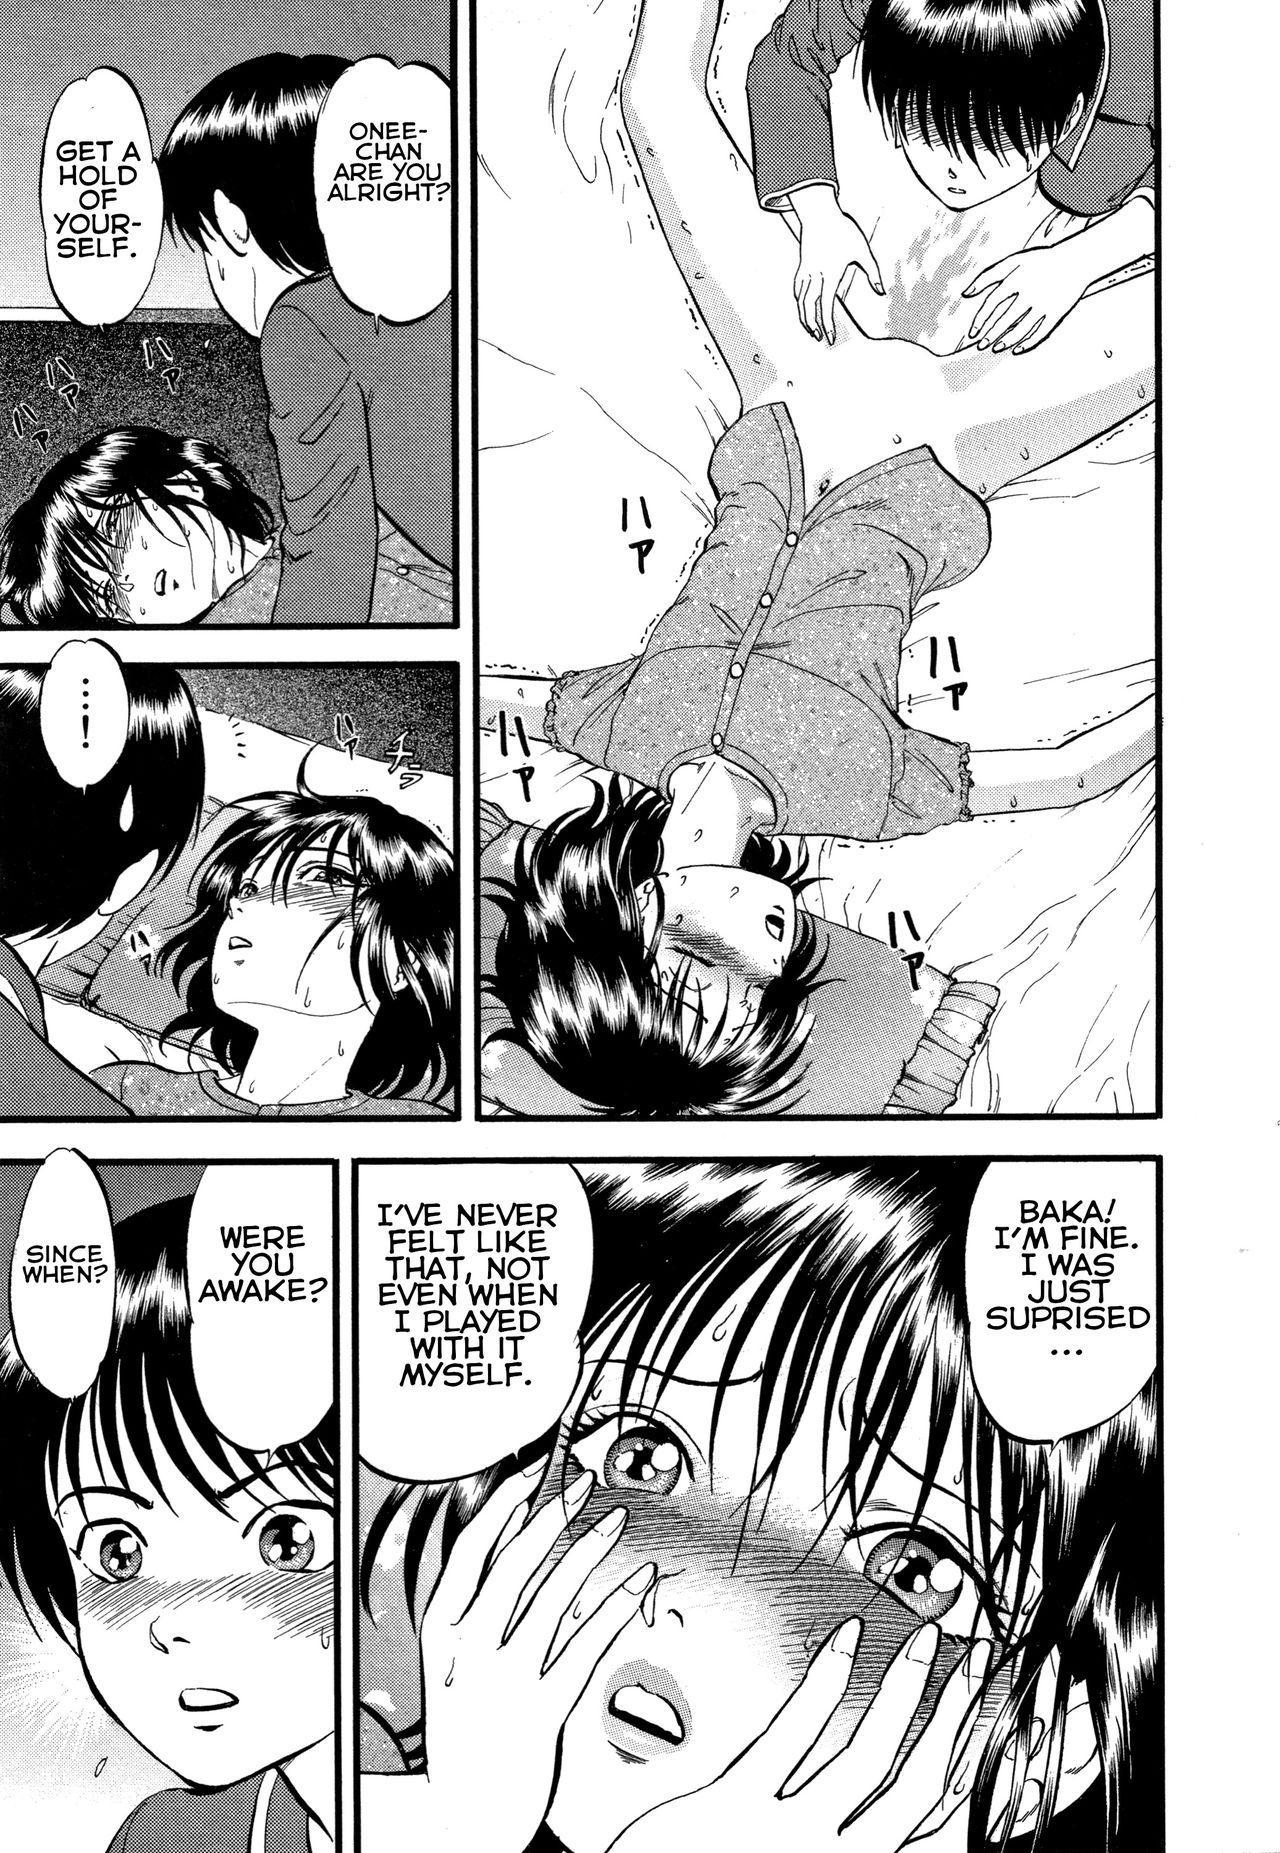 [RPG Company 2 (Yoriu Mushi)] R-Shitei Play 1 - Little Night Crawling [English] 17